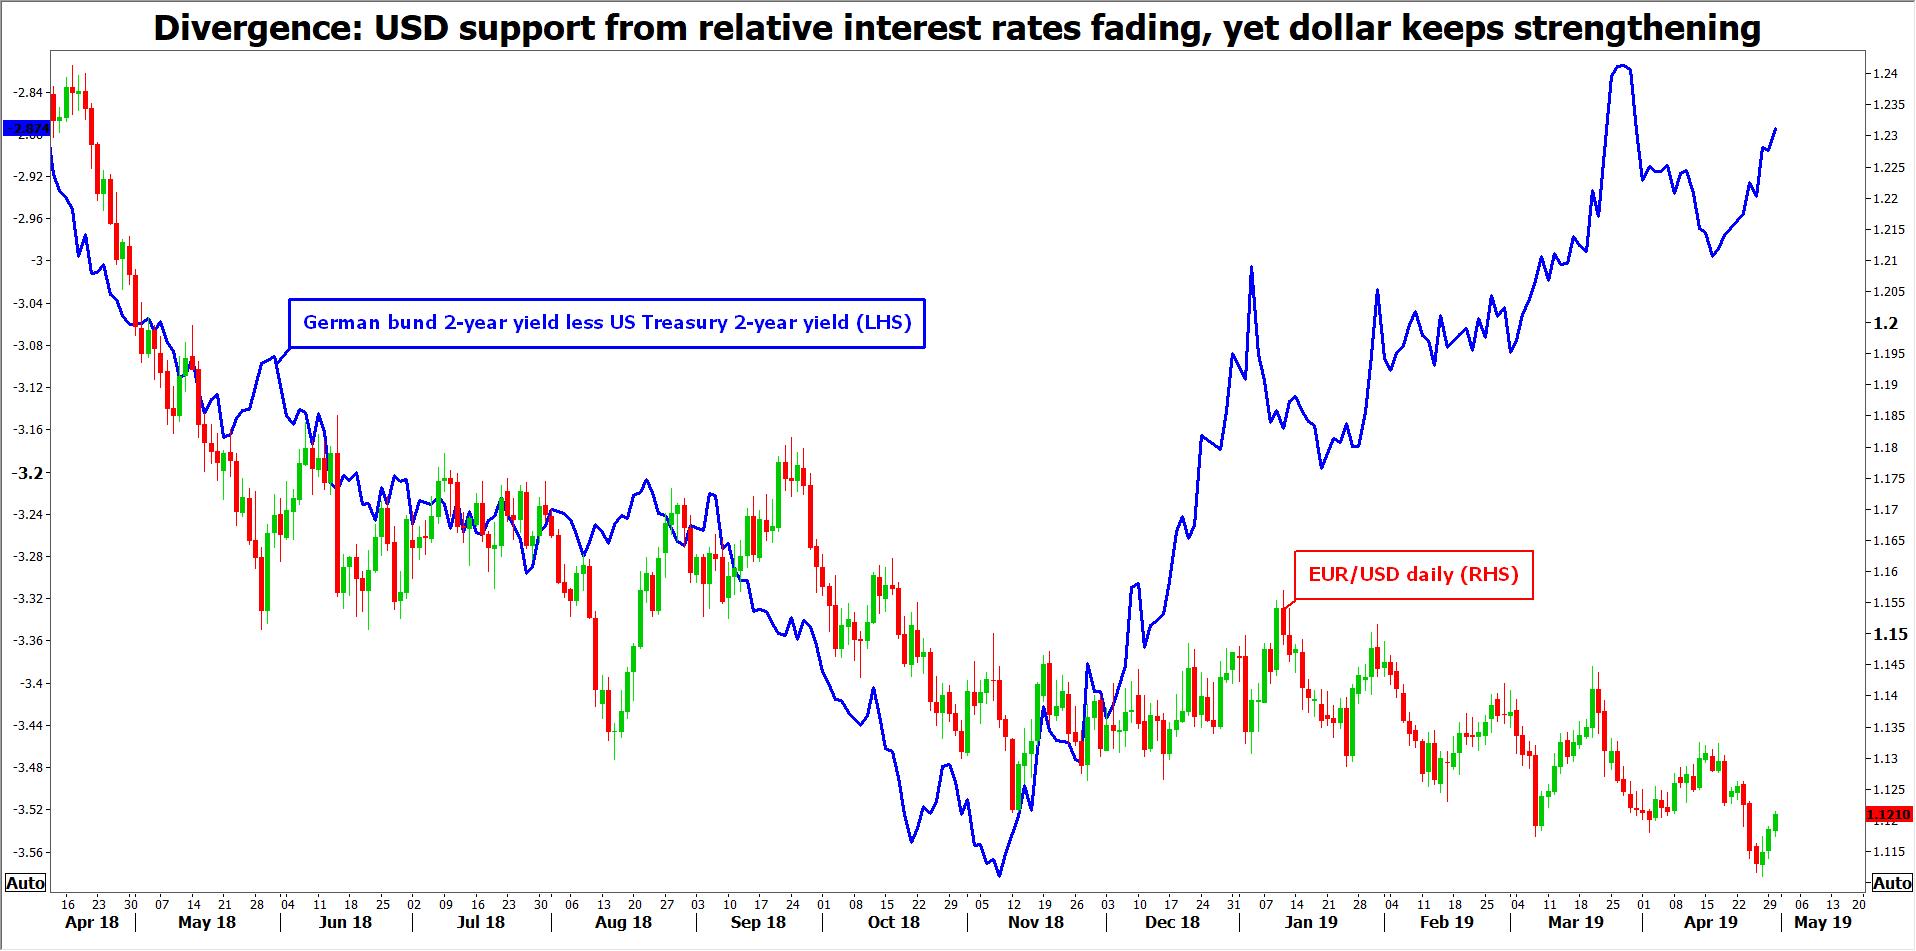 eurusd divergence taux